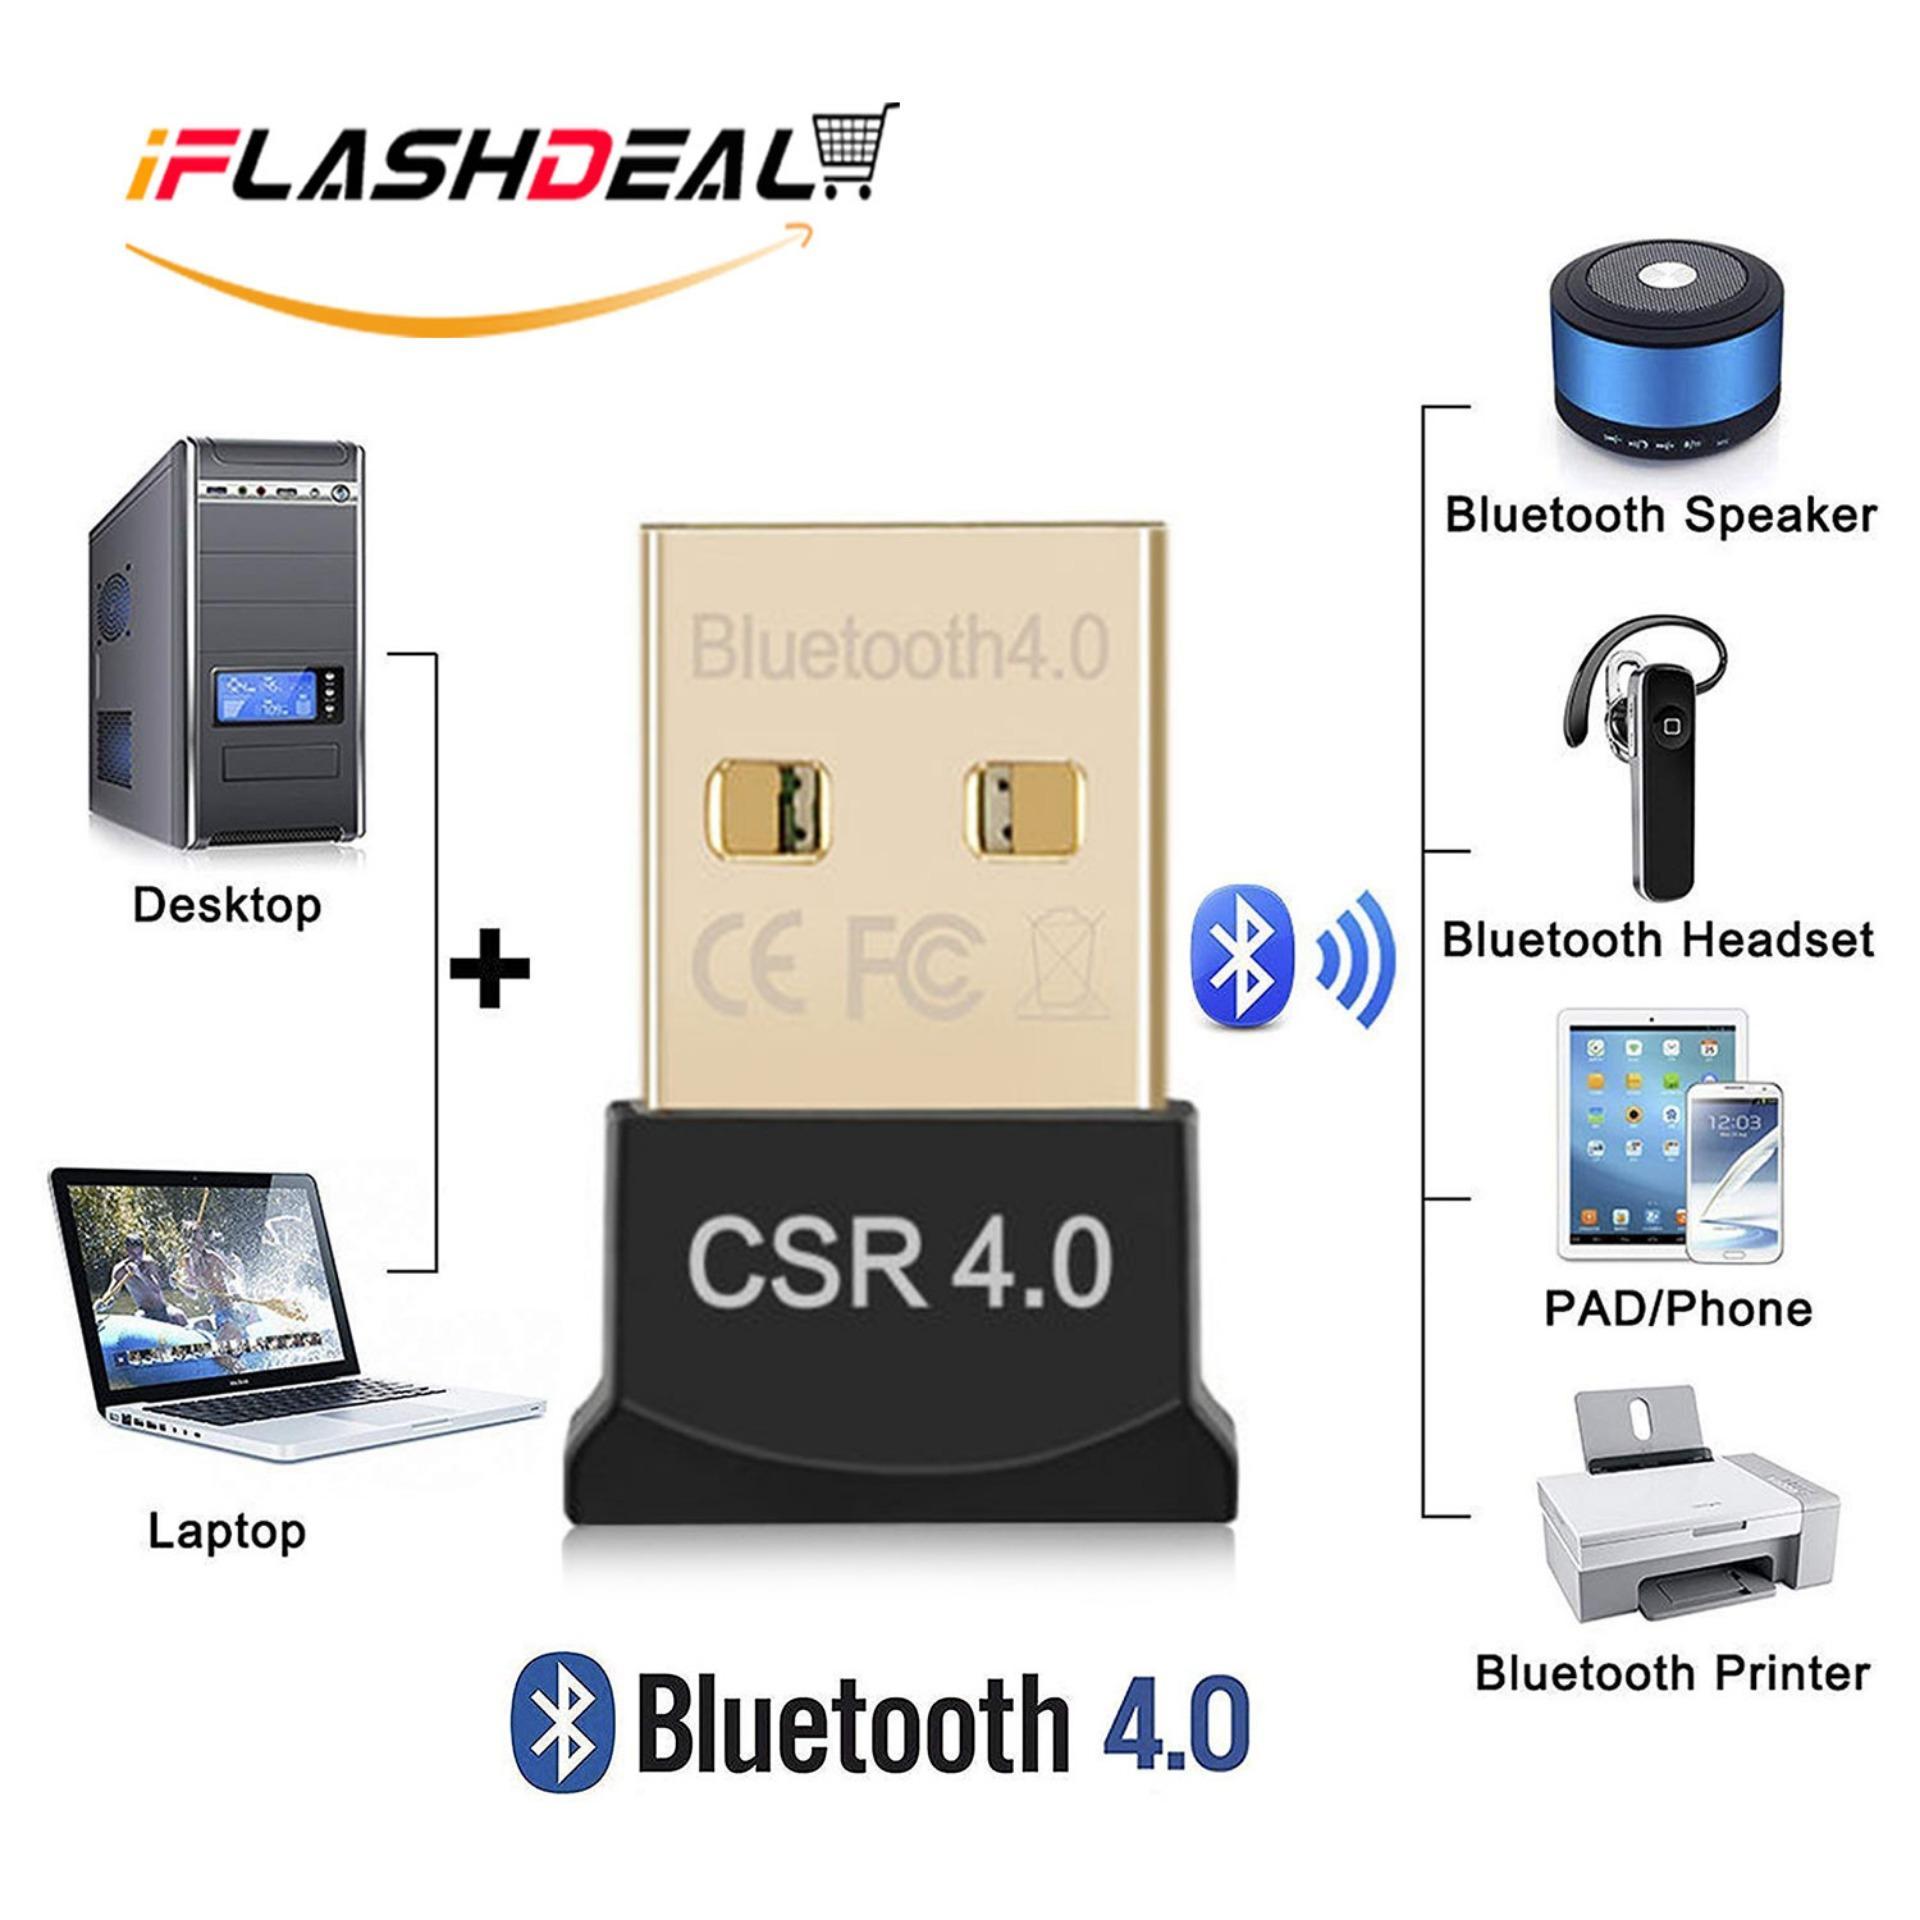 insignia bluetooth adapter driver windows 8.1